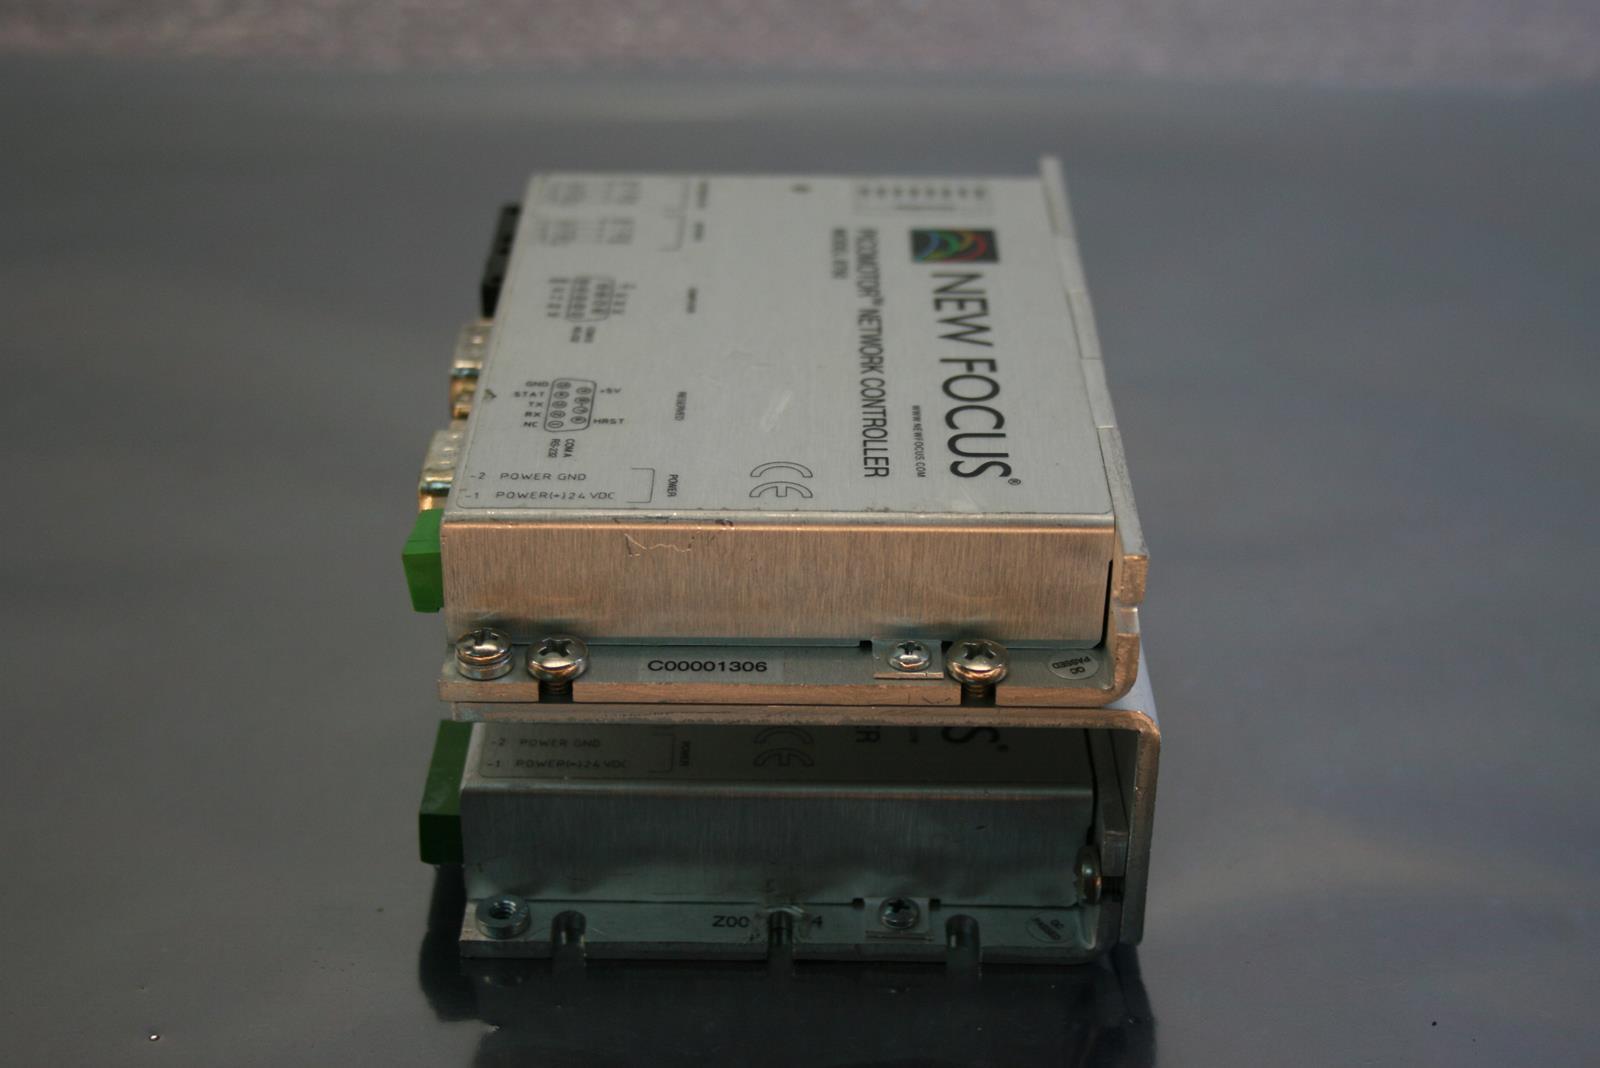 MODEL 8753 INTELLIGENT PICOMOTOR WINDOWS XP DRIVER DOWNLOAD